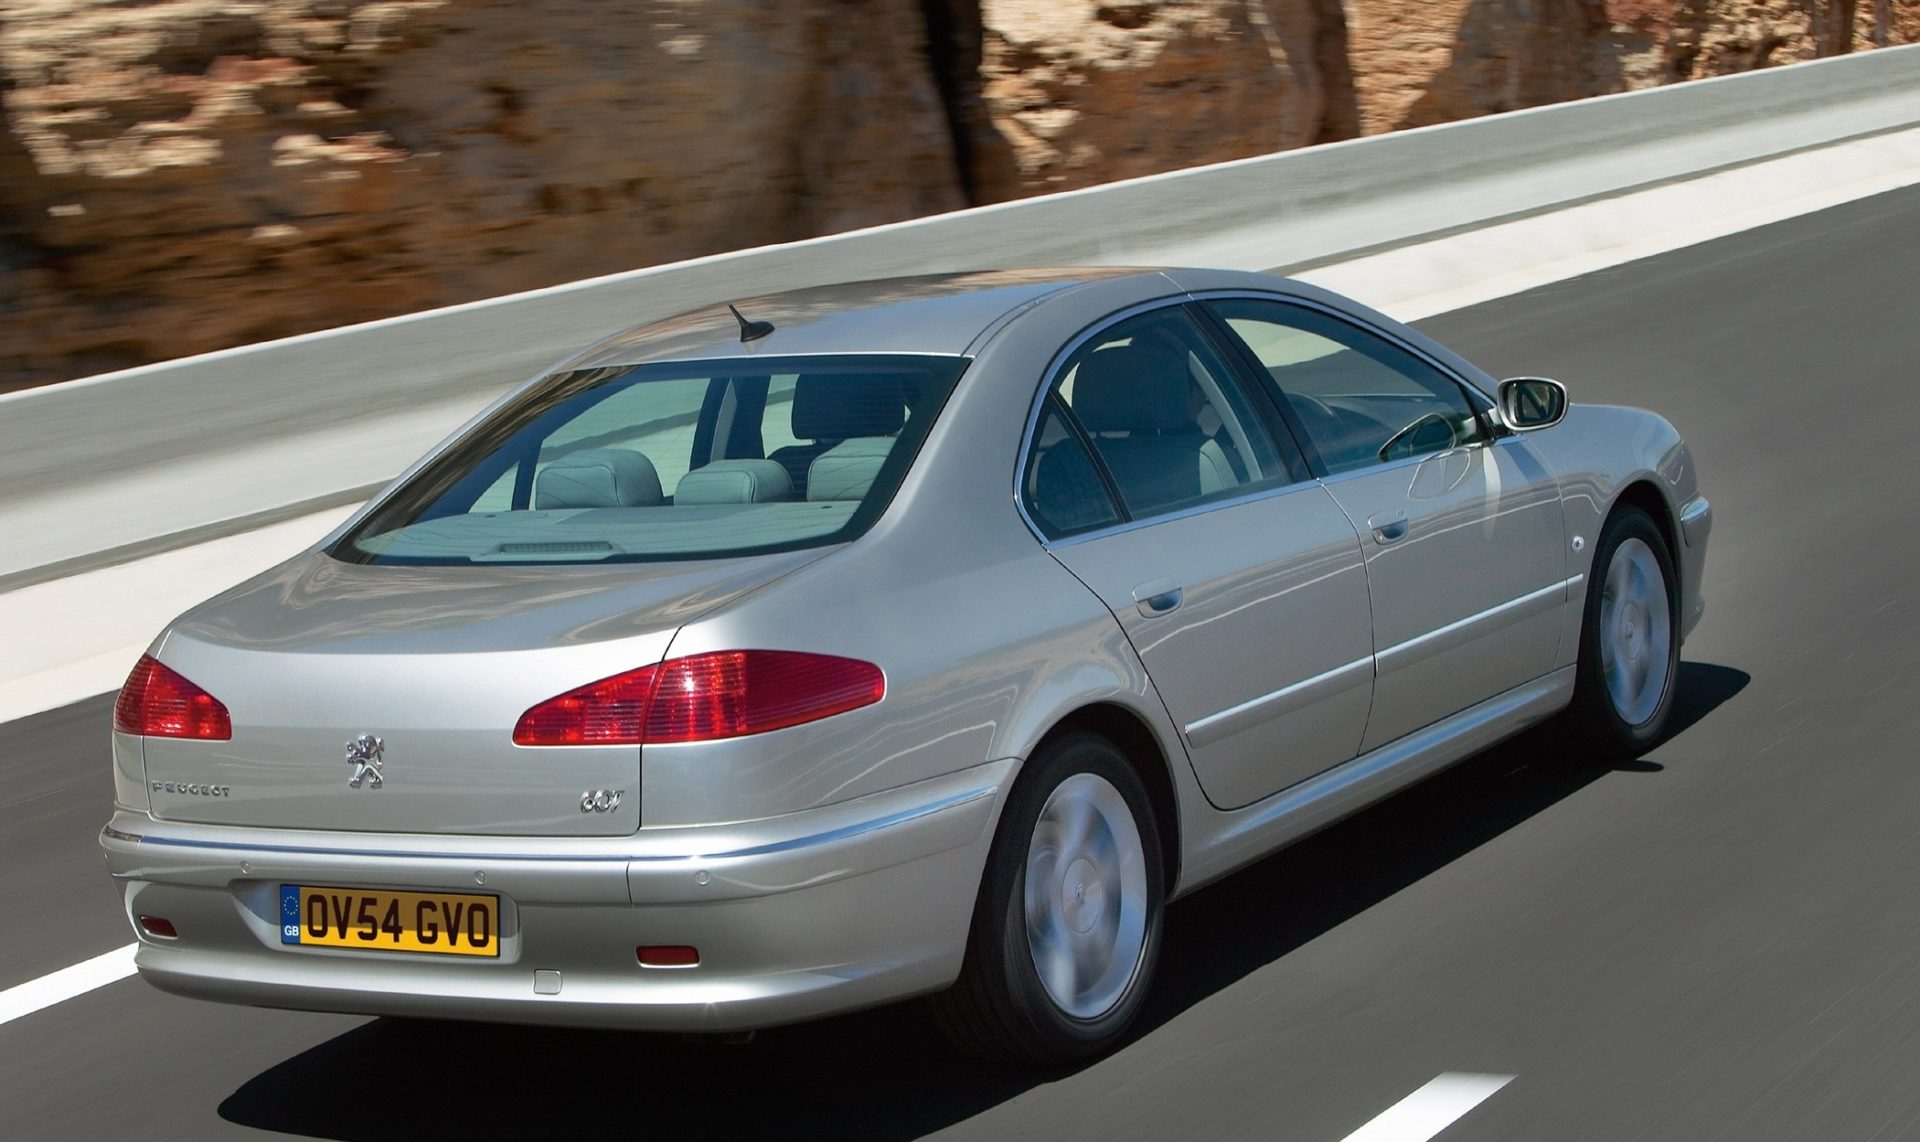 Peugeot 607, Peugeot, 607, luxury car, executive car, 607 buying guide, motoring, automotive, car, cars, classic car, retro car, ebay, ebay motors, autotrader, cazana, cheap car, bargain car, adrian flux, not2grand, www.not2grand.co.uk, car, cars, featured